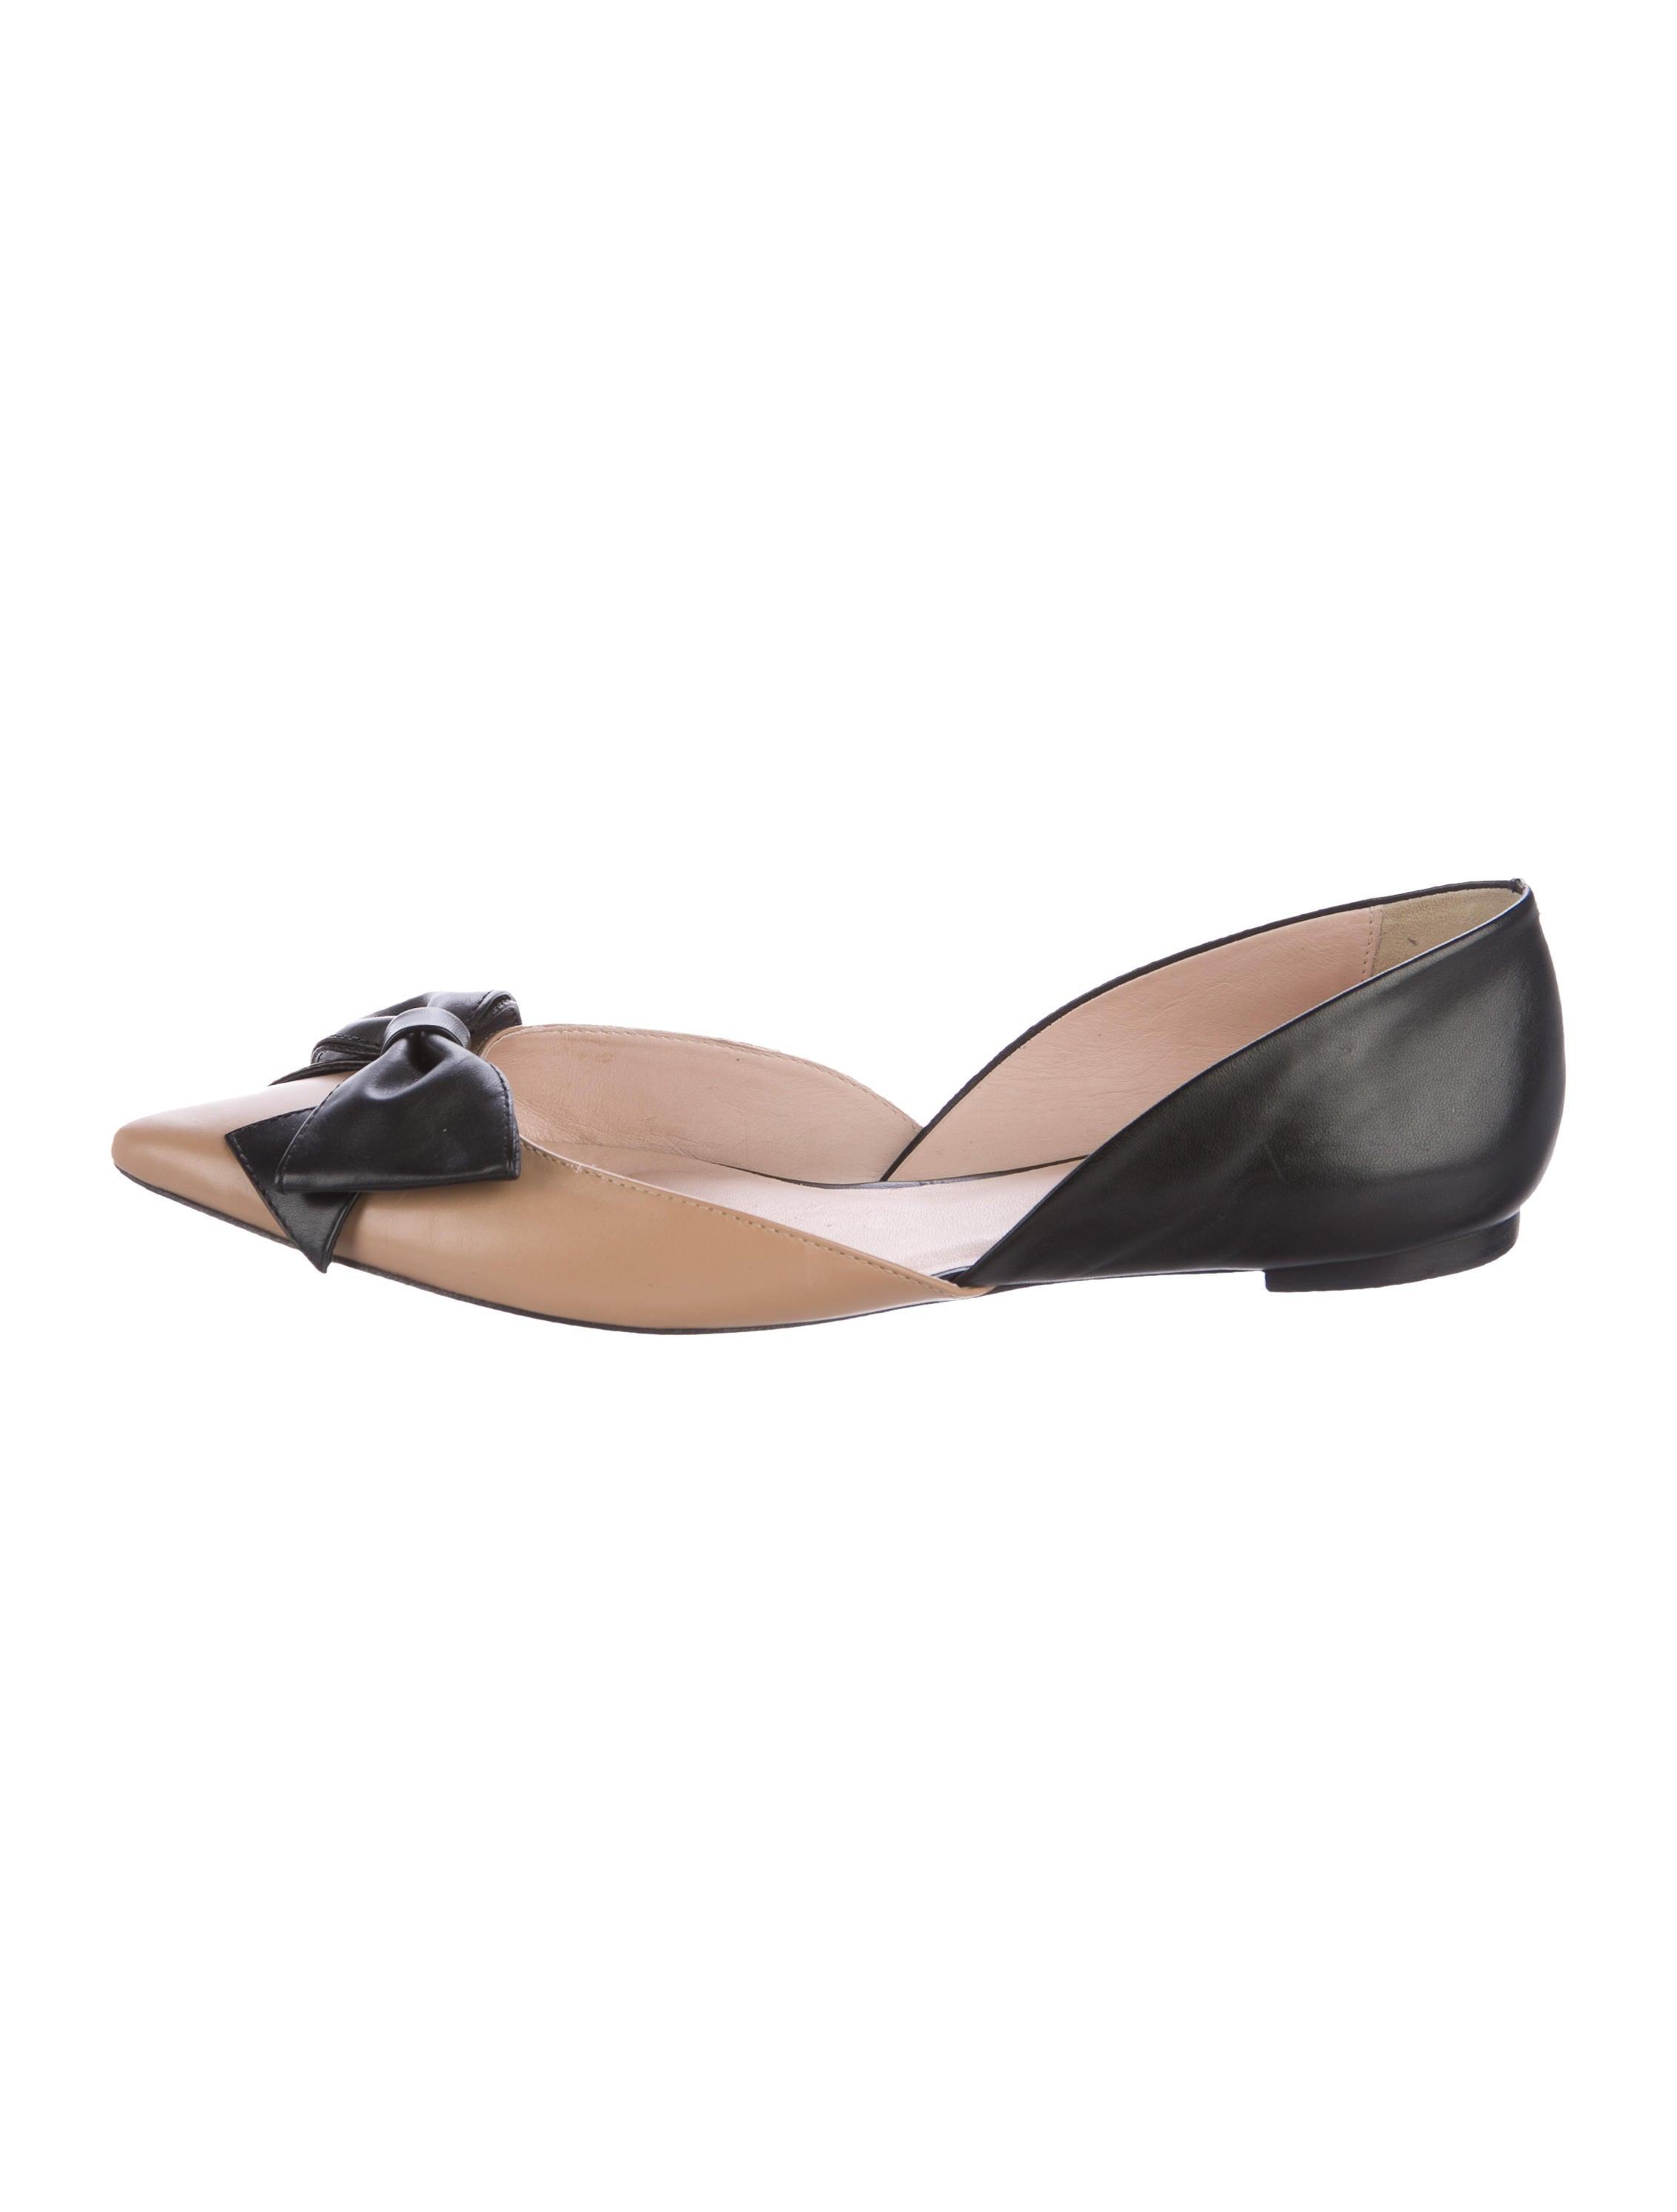 Kate spade new york selma d 39 orsay flats shoes wka68292 for Kate spade new york flats